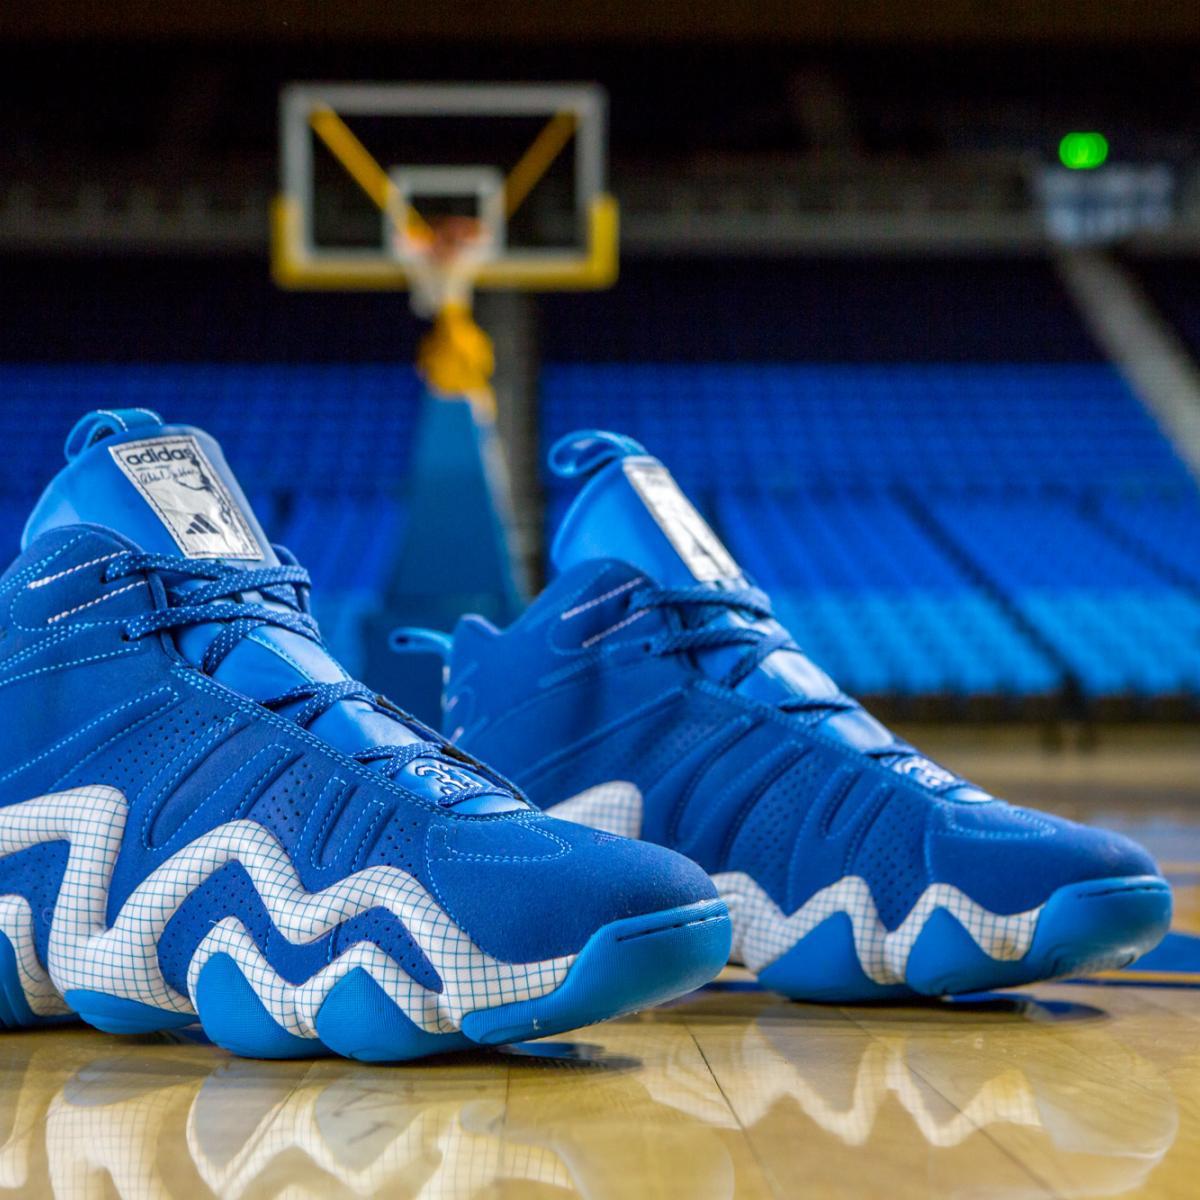 f812b66236a Adidas Honors Kareem Abdul-Jabbar with  The Blueprint  Crazy 8 Shoe ...